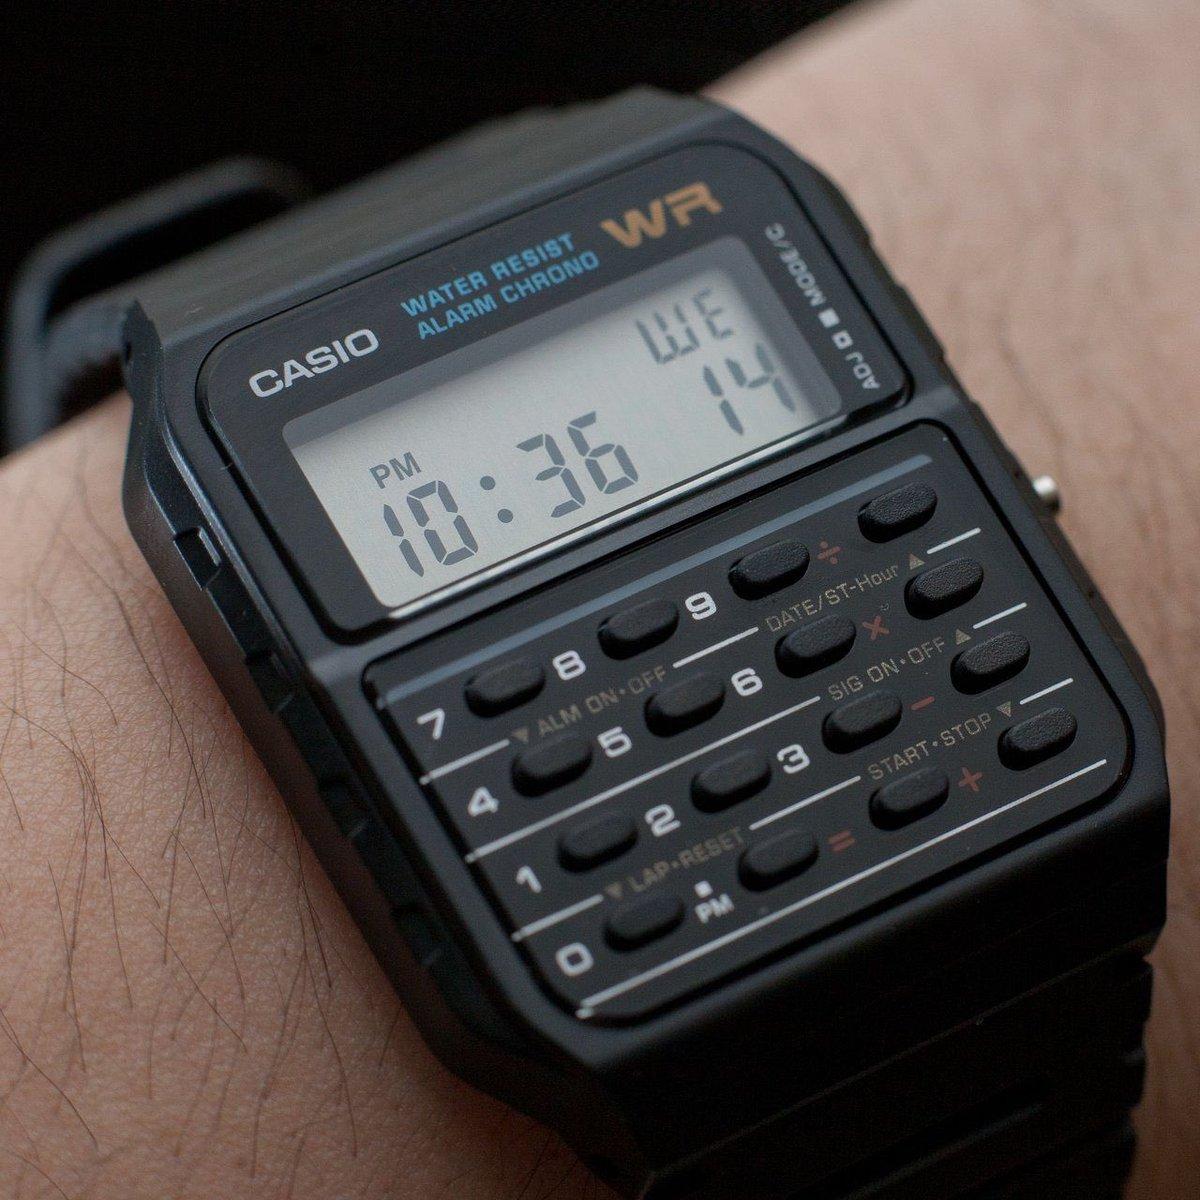 My dream watch! A big deal back then...😁 https://t.co/eCjiKmOyqR